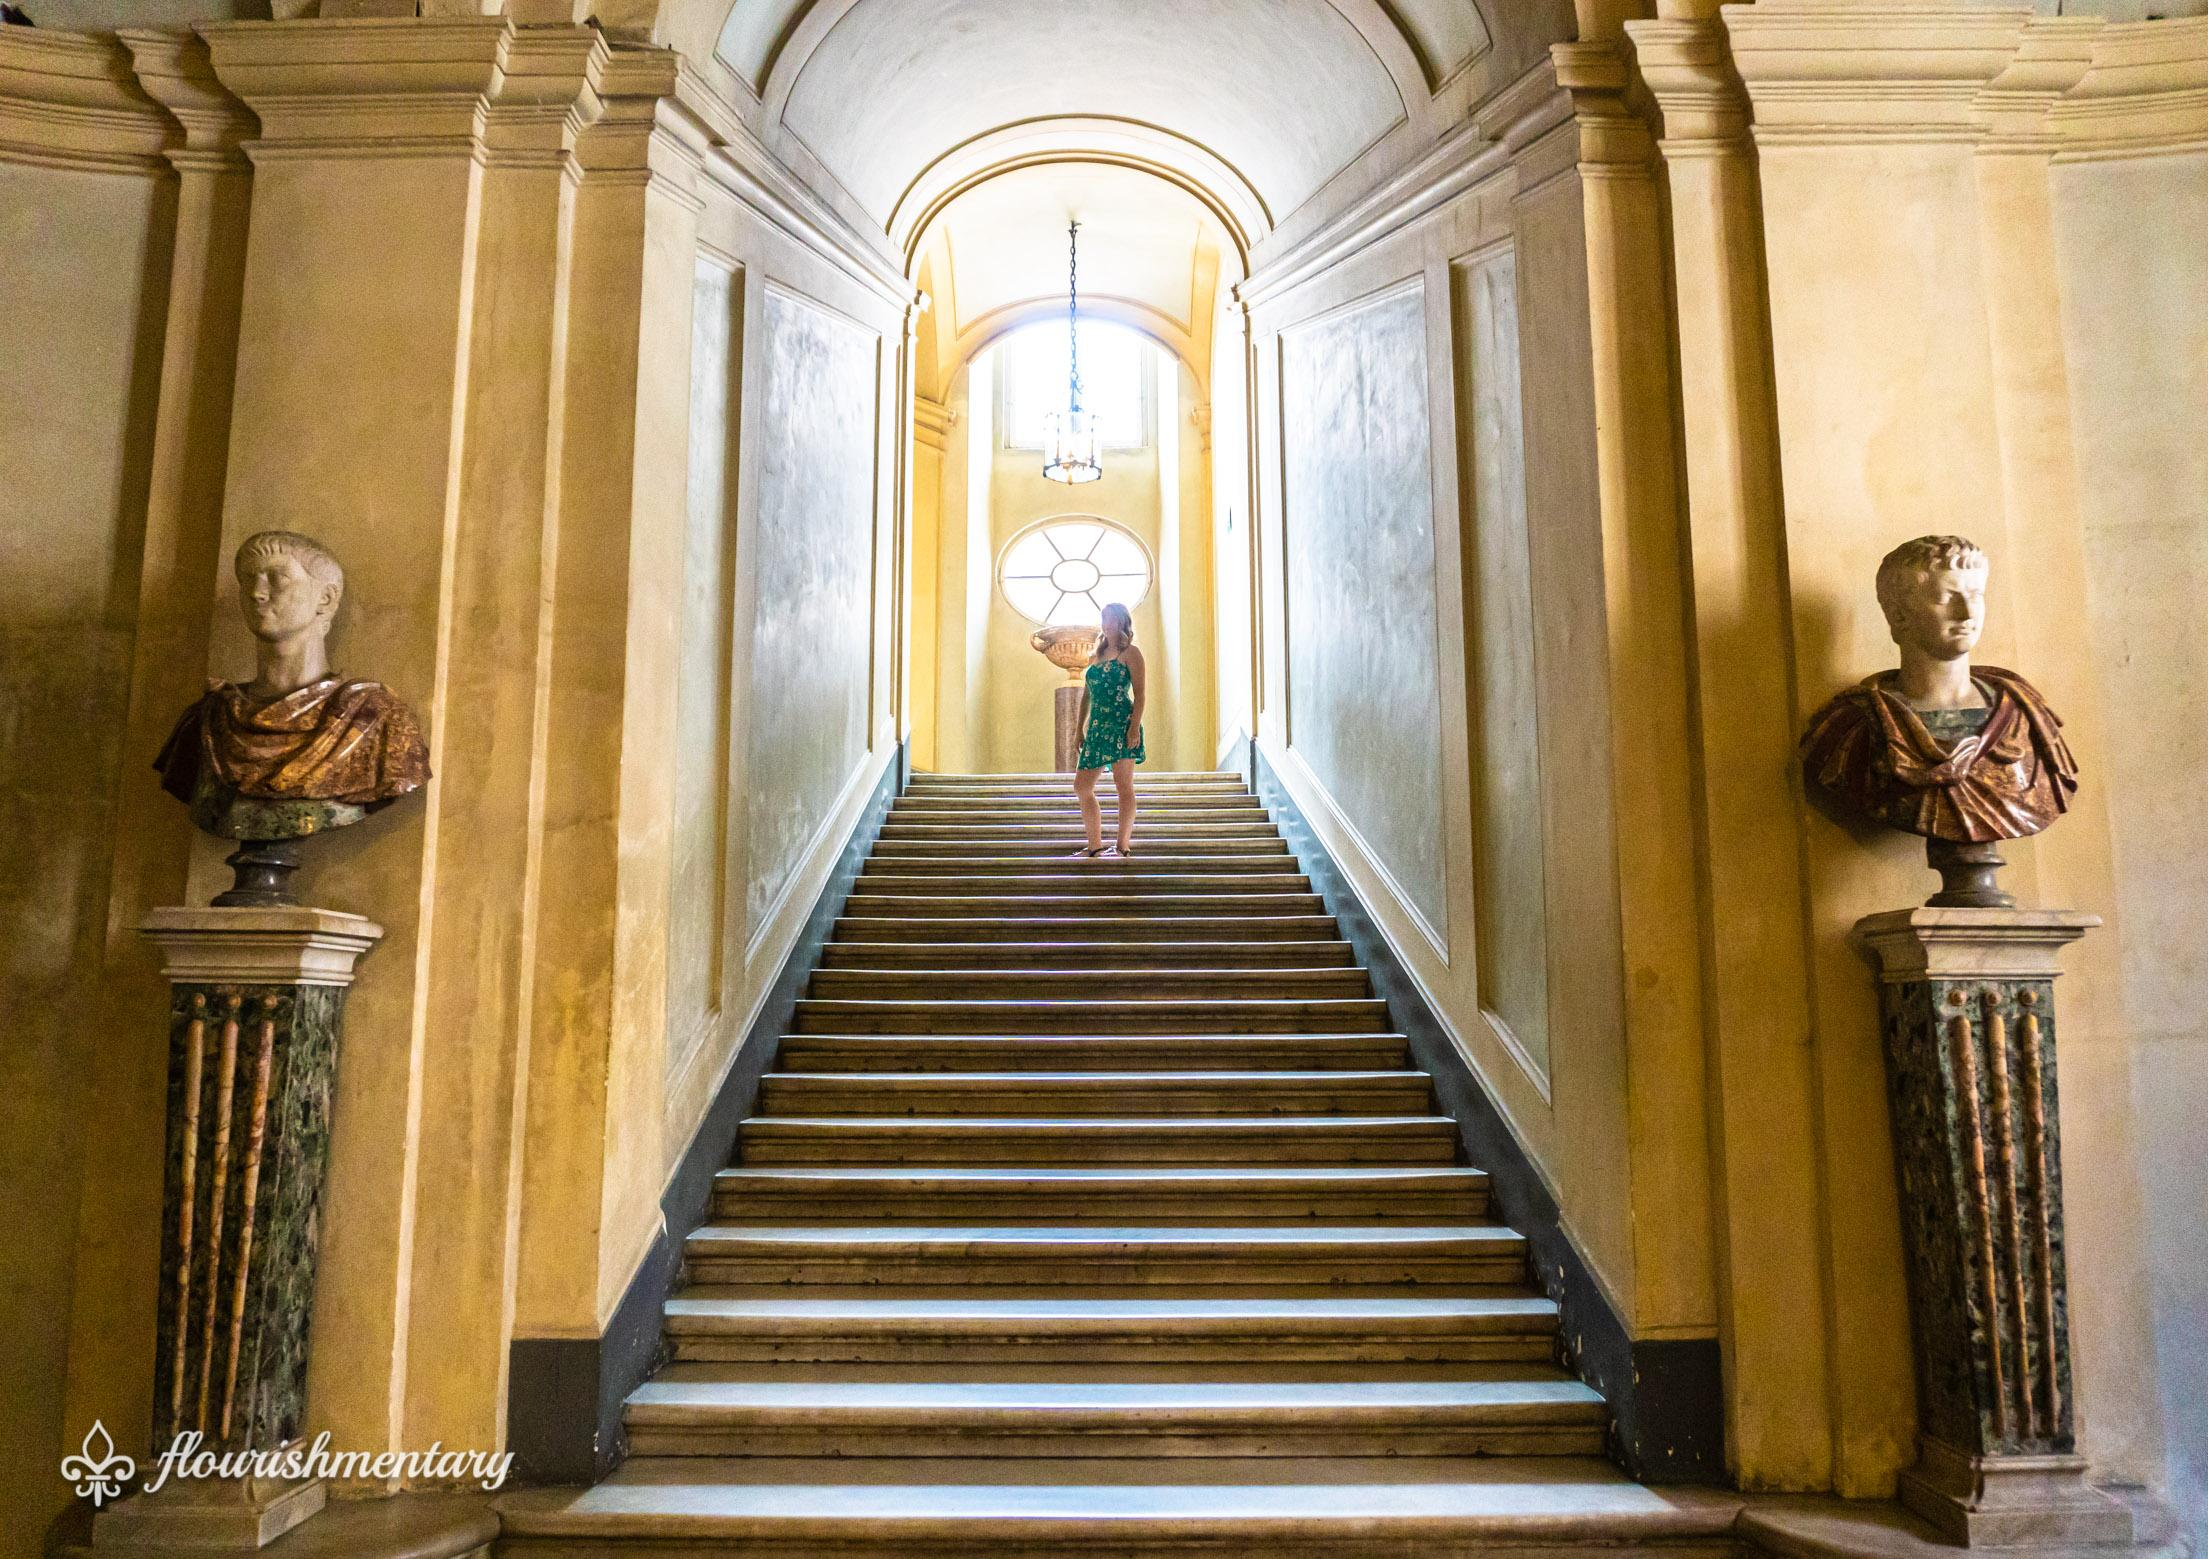 the entryway Doria Pamphilj gallery